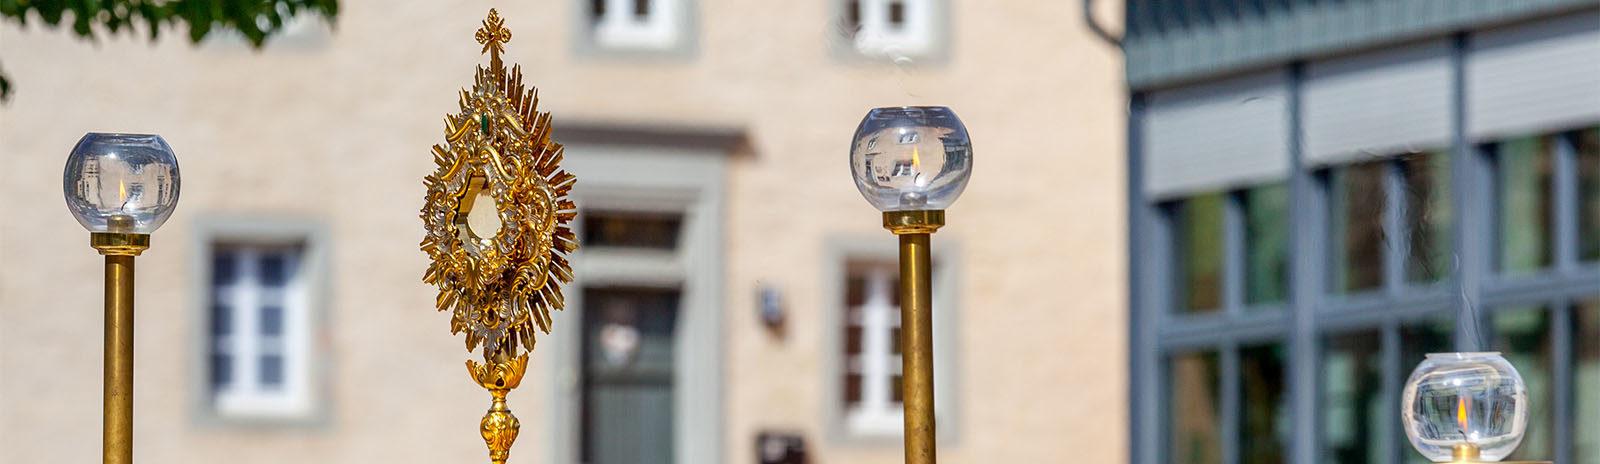 Haus_Prümtal_Lob_am_Sonntag_slider